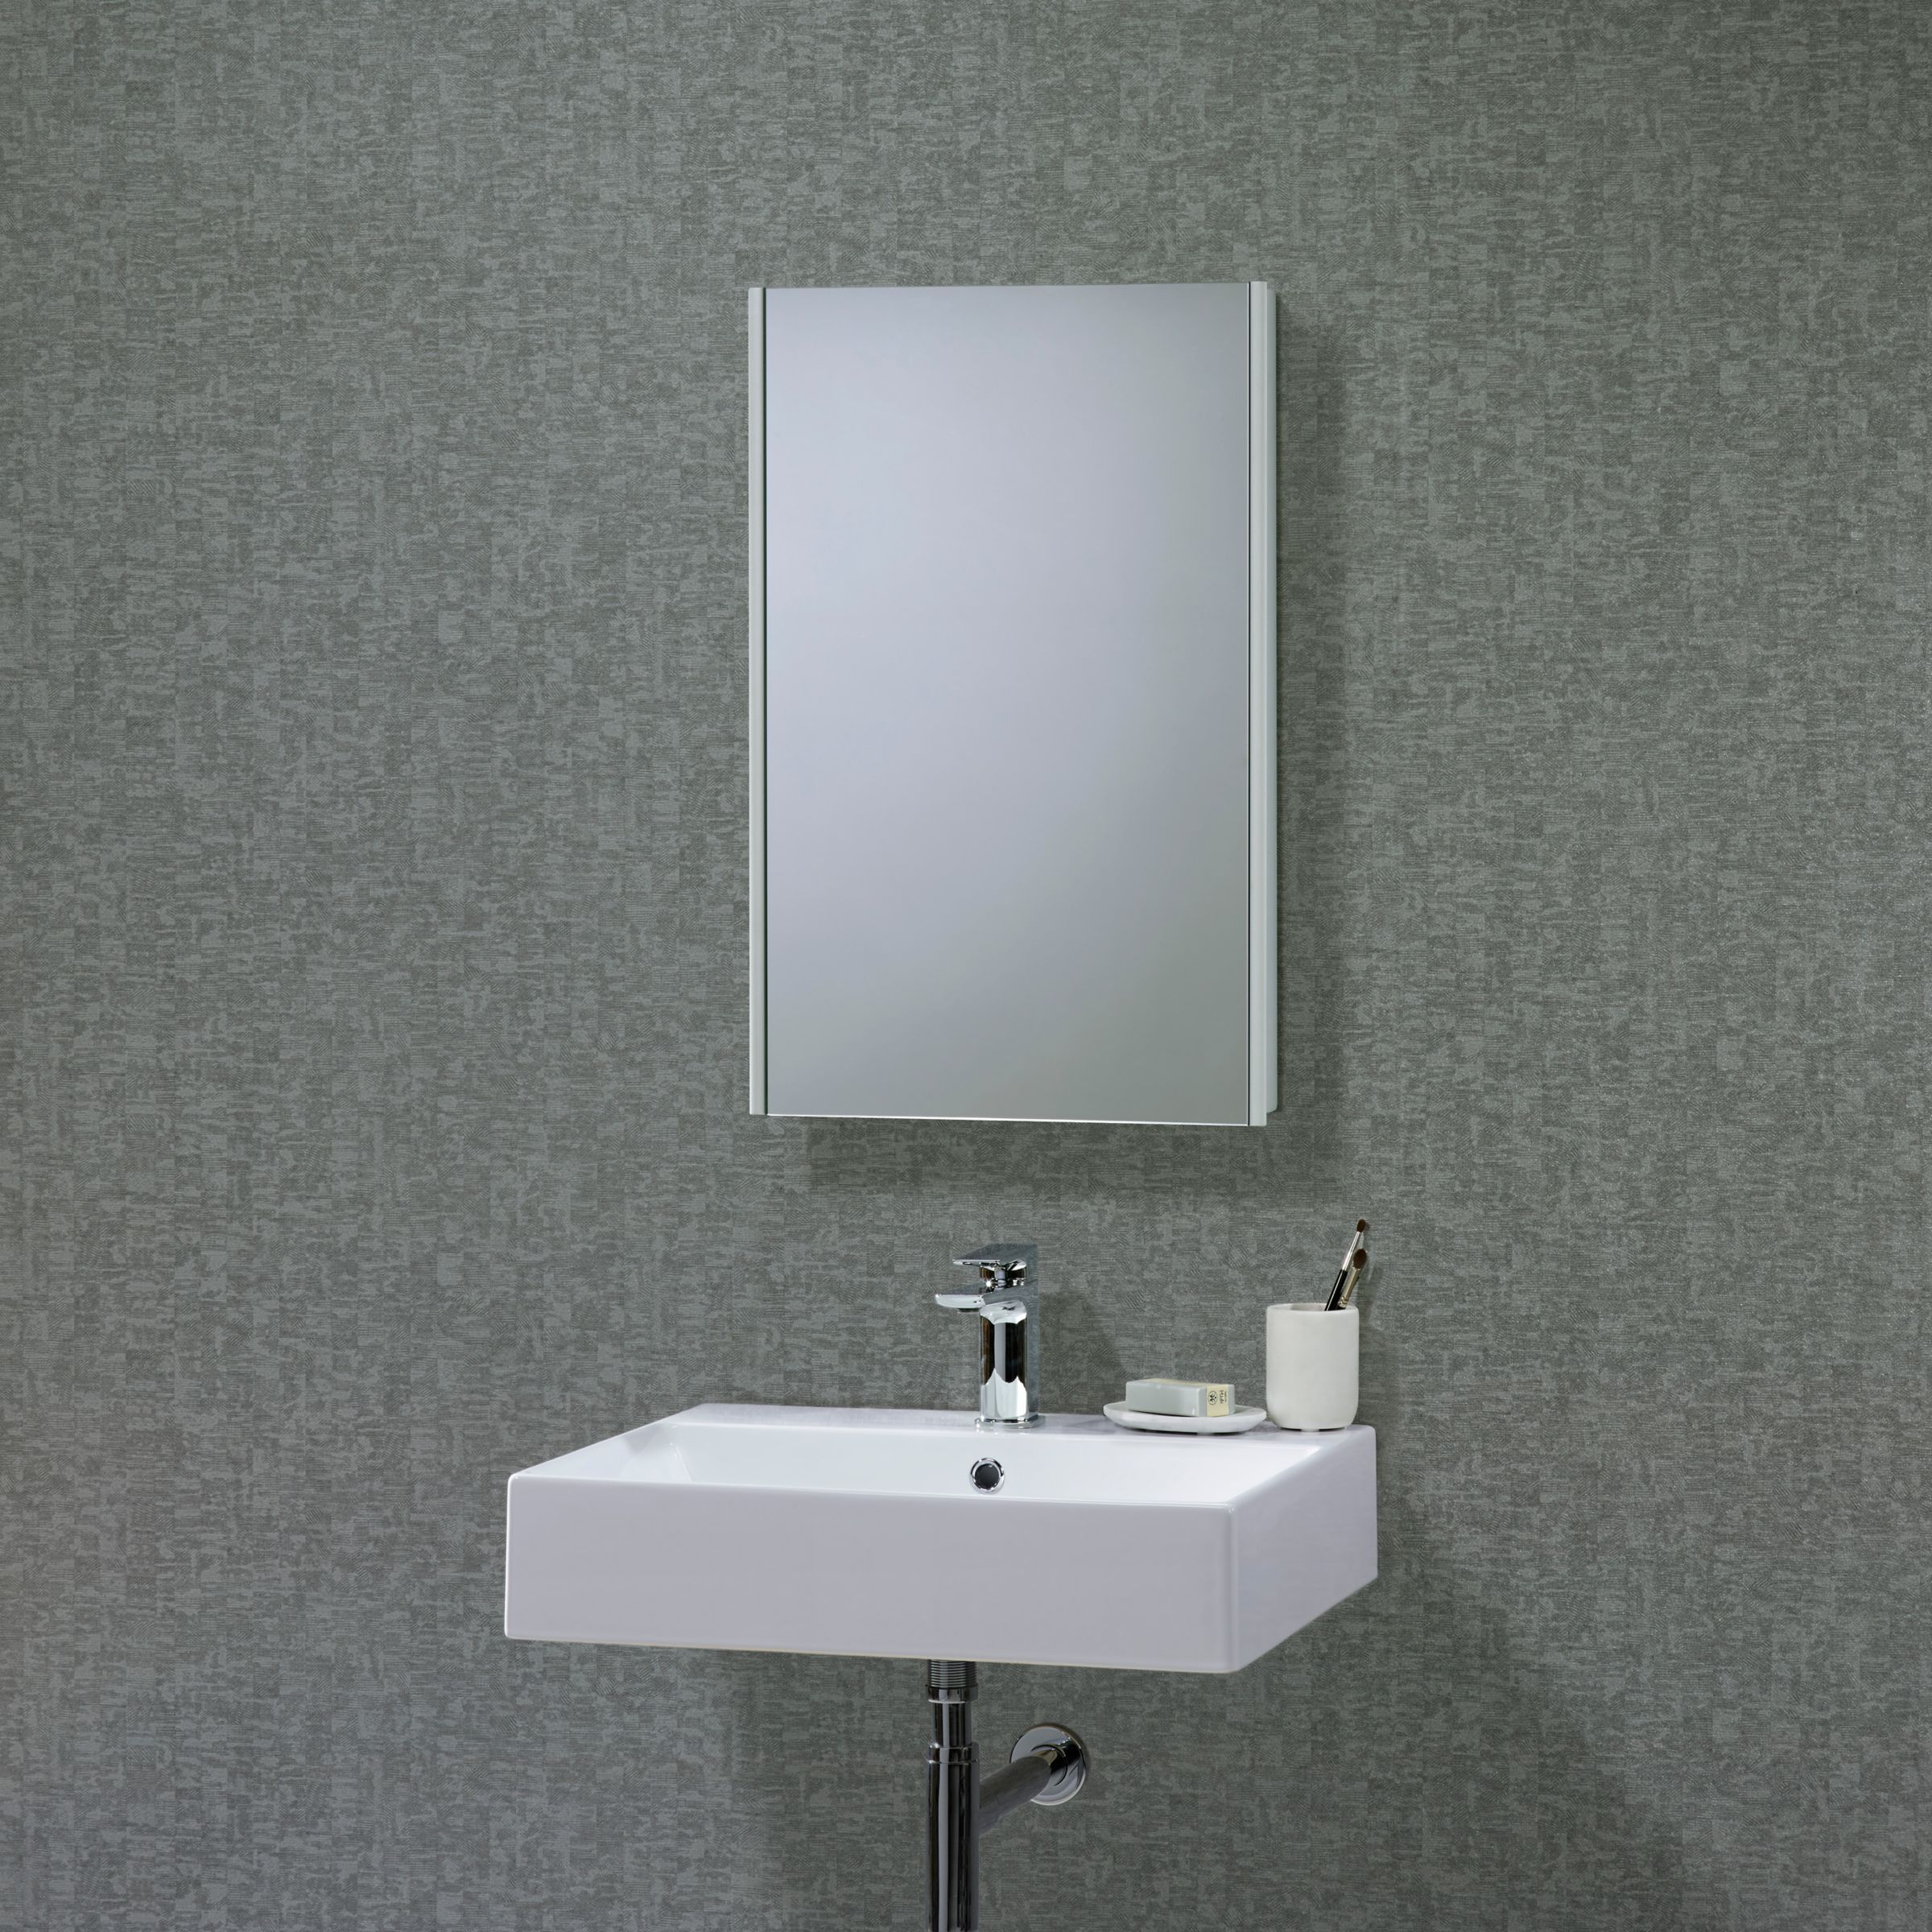 John Lewis Limit Slimline Single Door Bathroom Cabinet at John Lewis